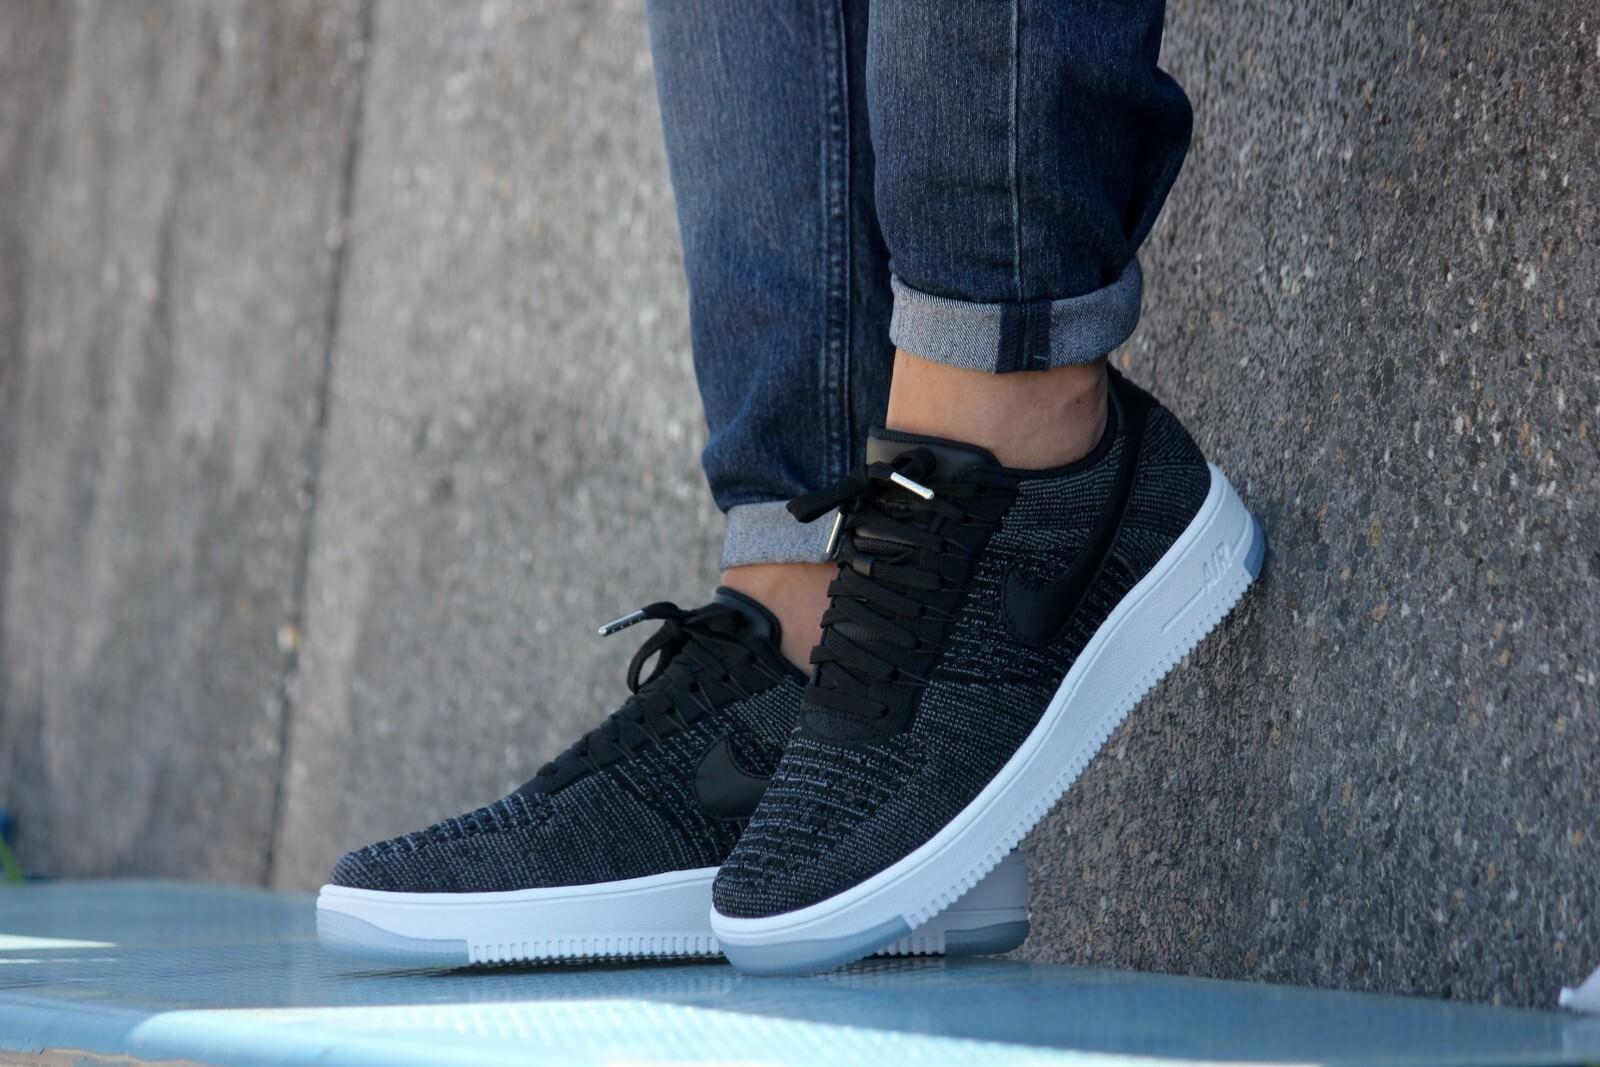 Nike WMNS Air Force 1 Flyknit Low Black Black White